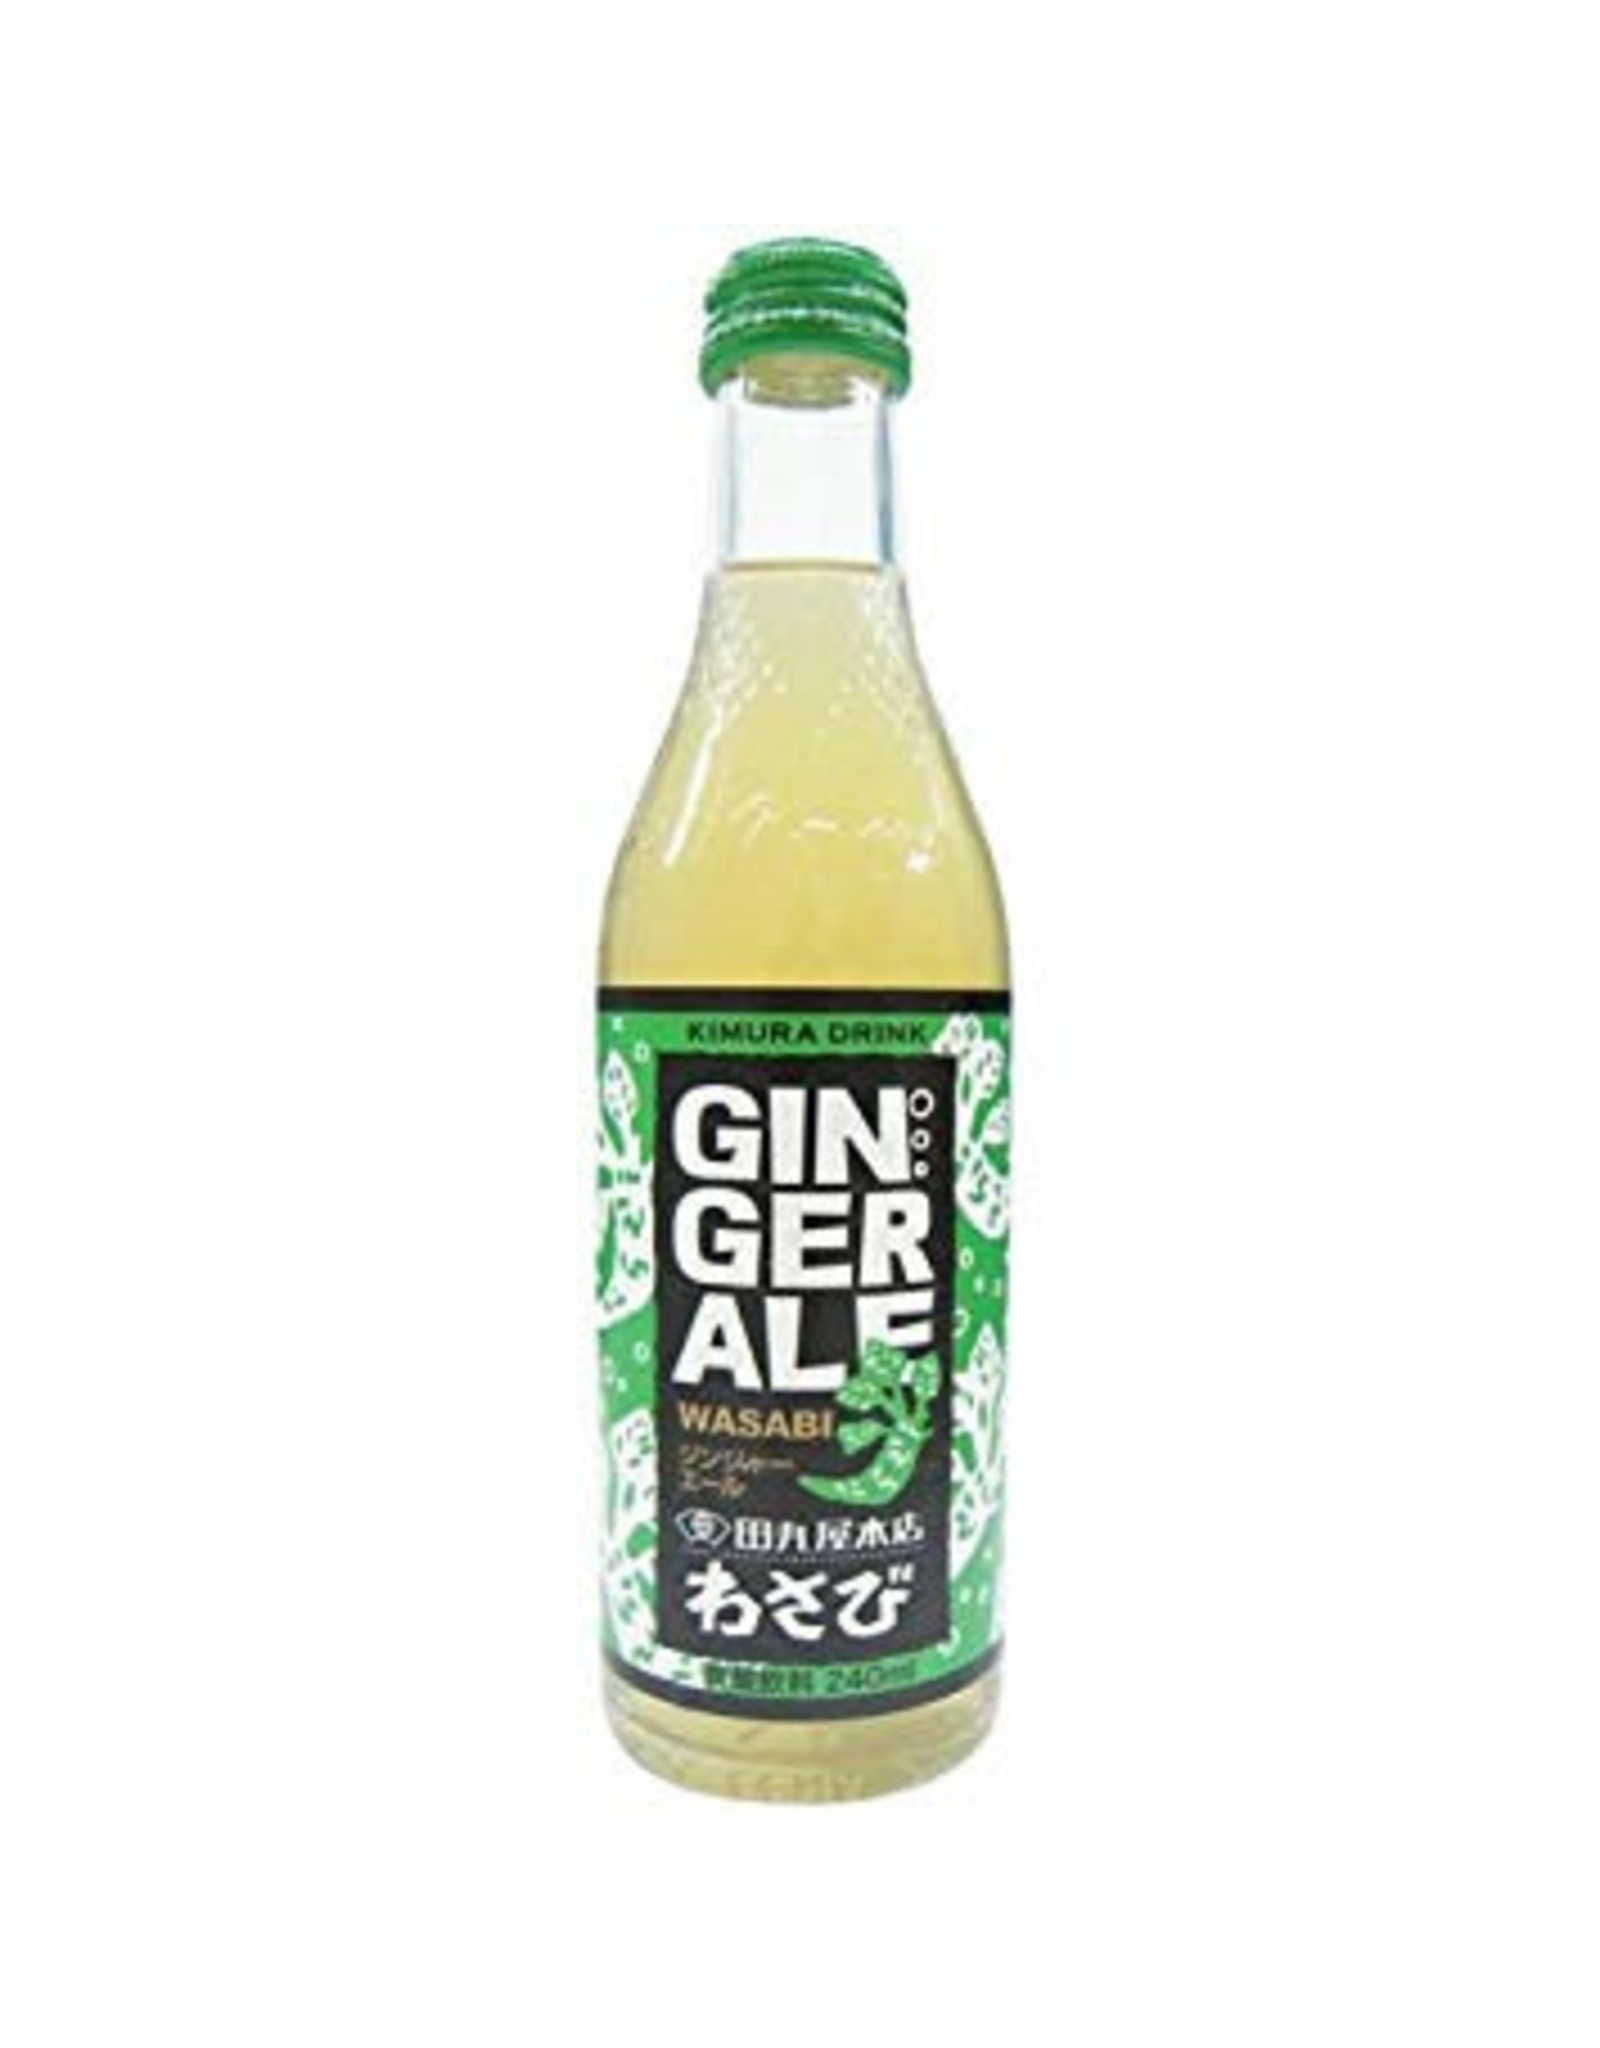 Wasabi Ginger Ale